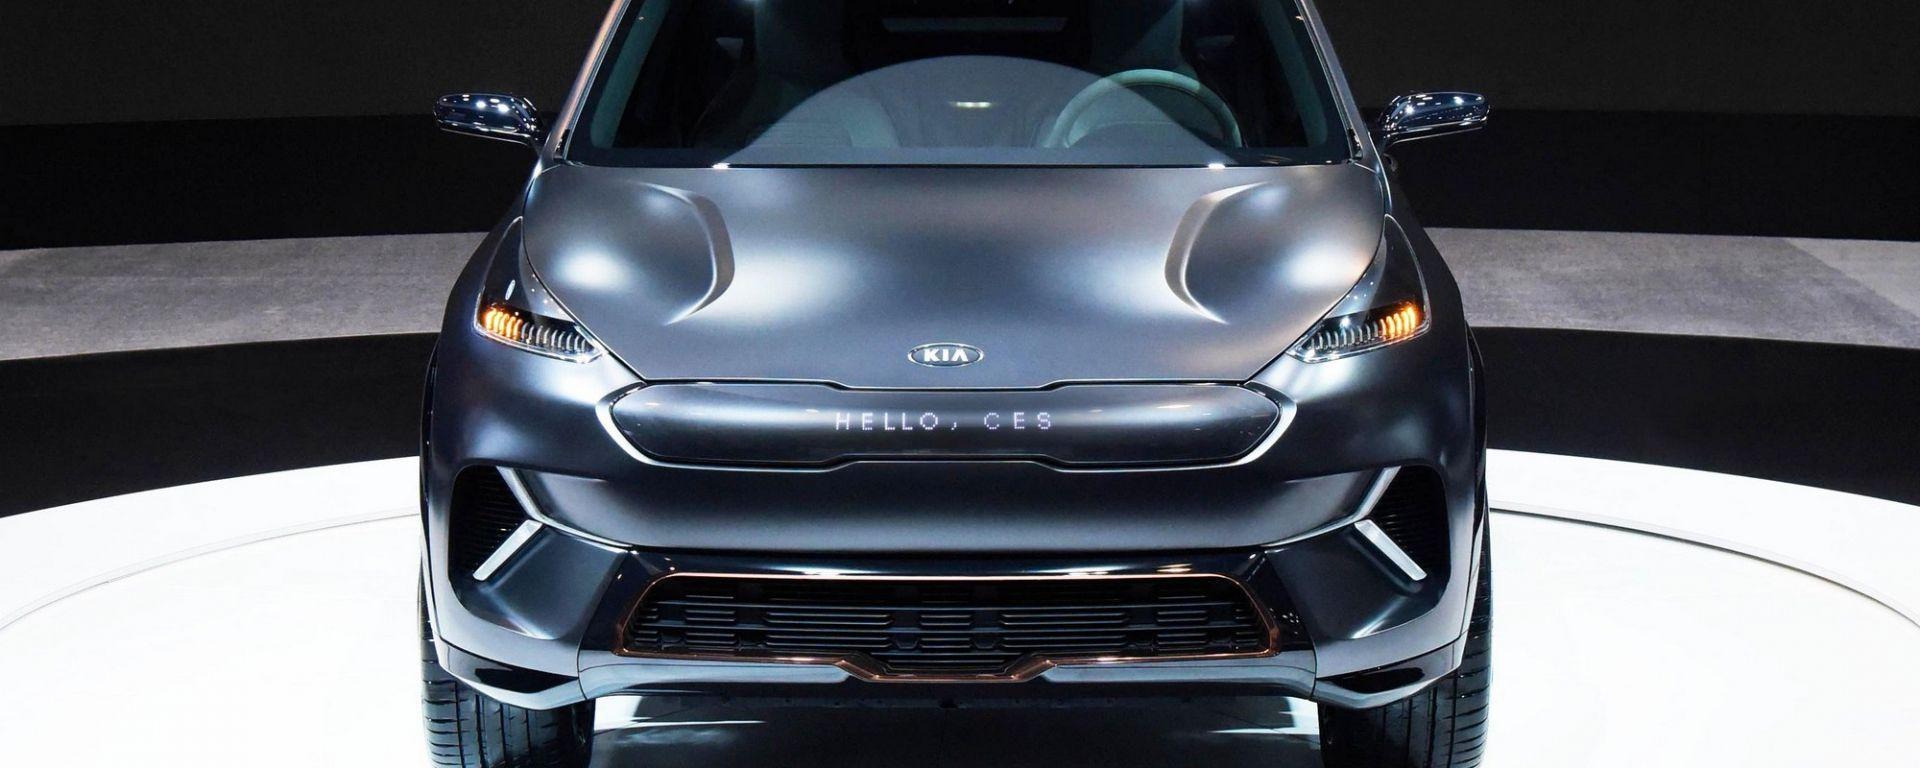 Niro EV: la crossover del futuro secondo Kia